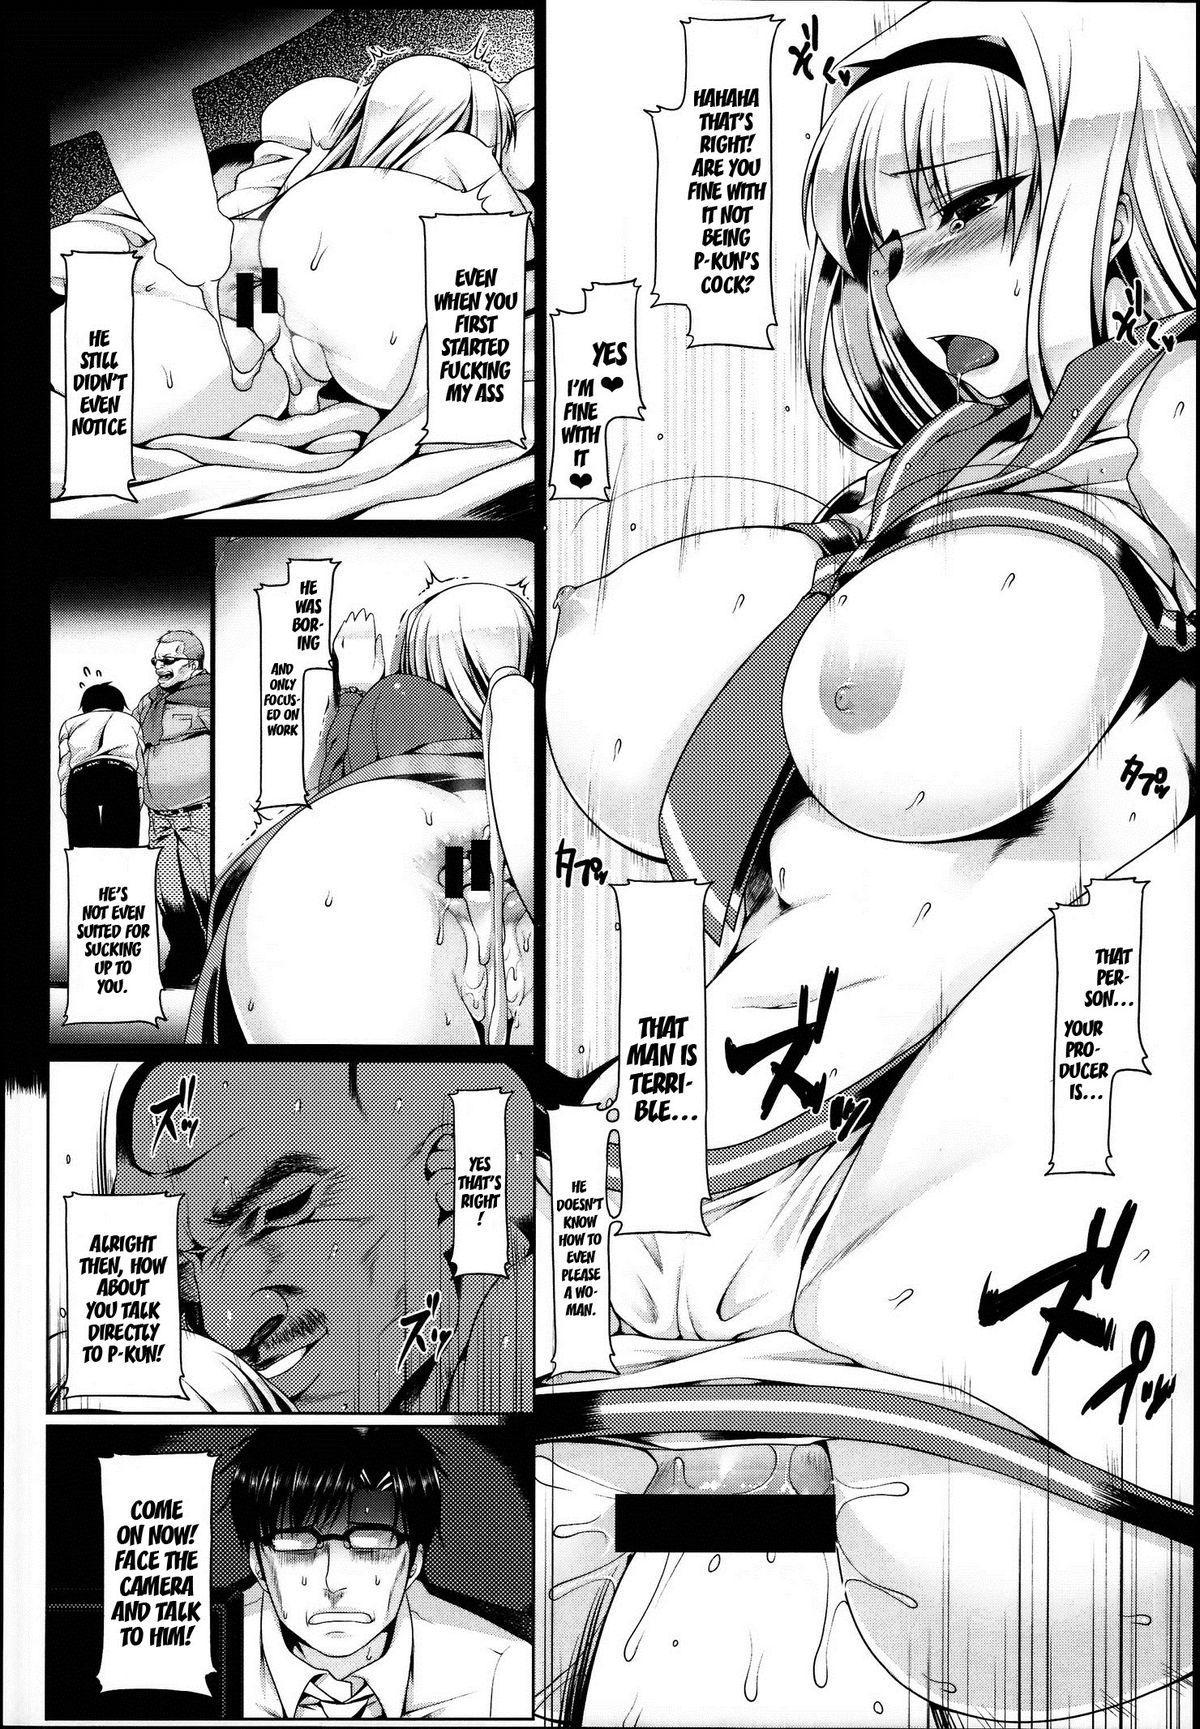 (C86) [Ruiketsuan (Namidame)] Oshiri-Hime no Koufuku   Anal-Princess's Happiness (THE iDOLM@STER) [English] [doujin-moe.us] 16